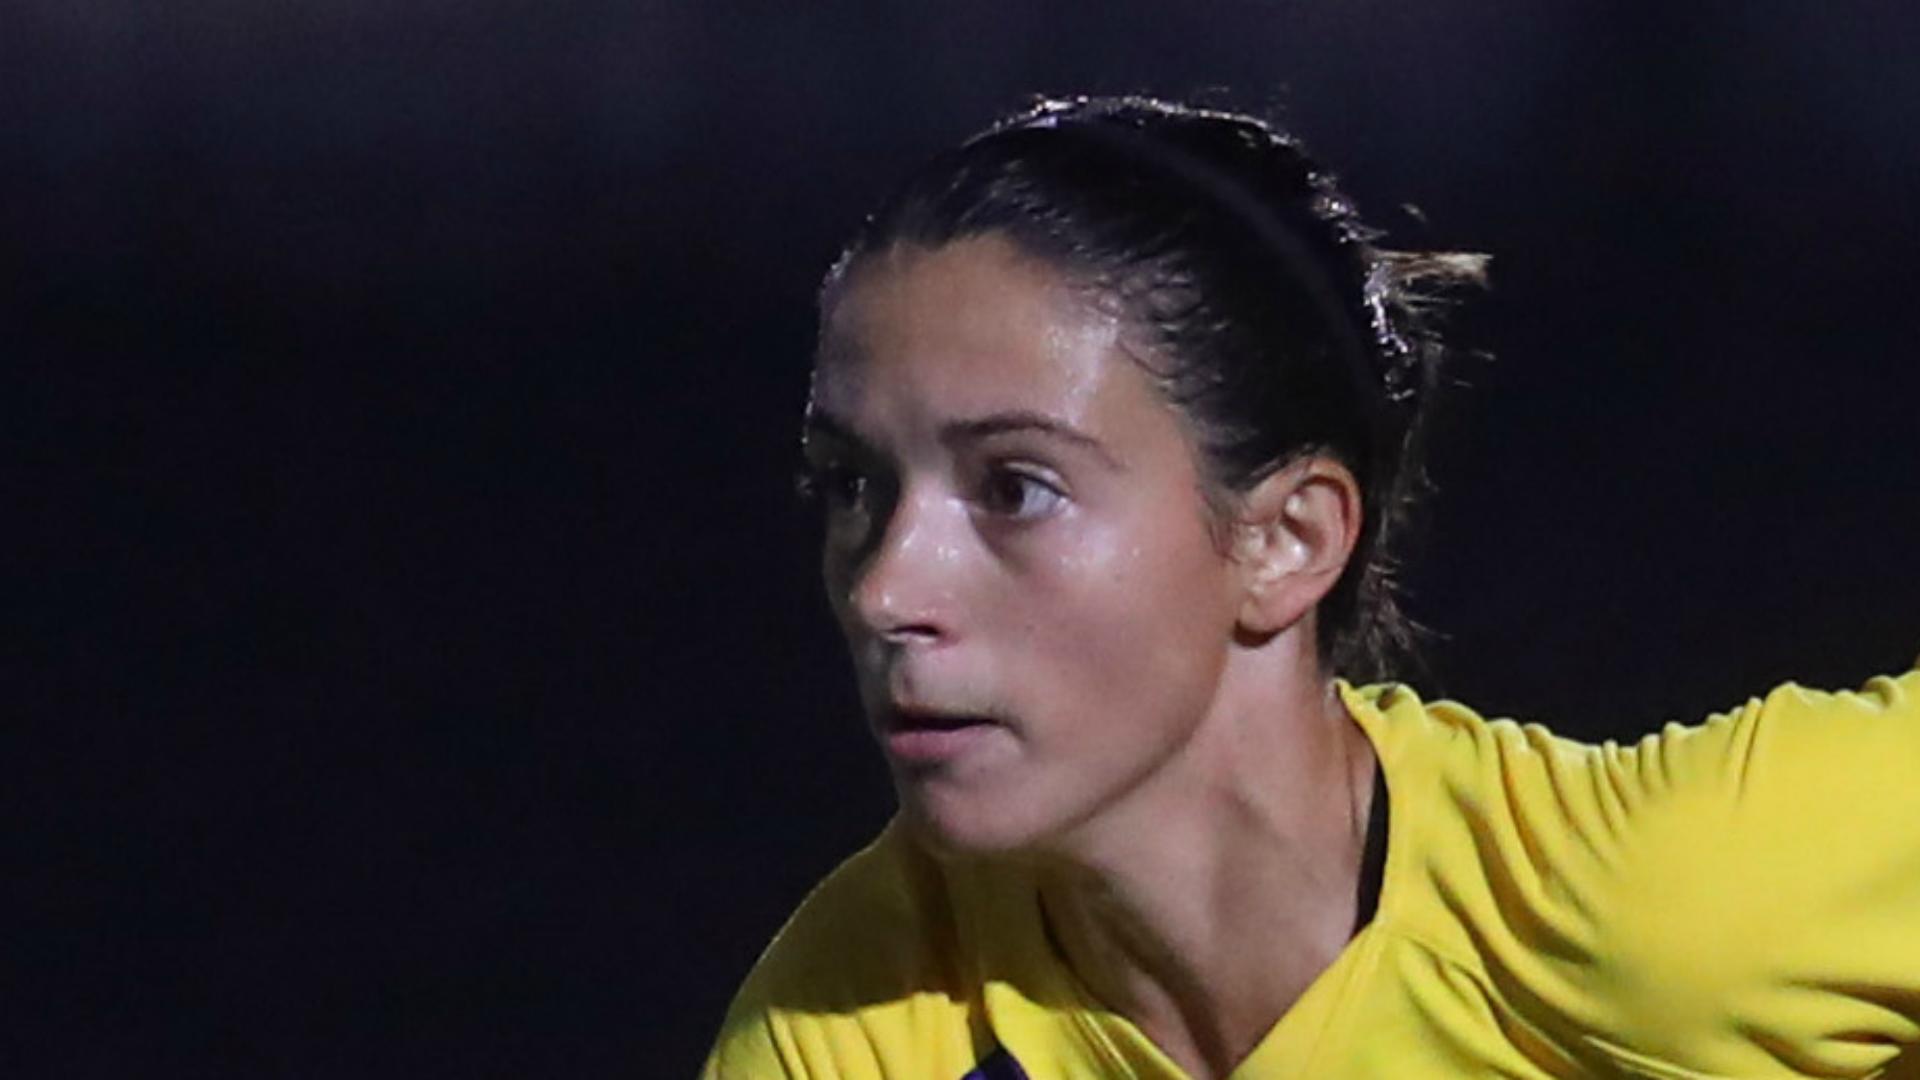 Barcelona earn crushing 9-1 win in first women's Clasico